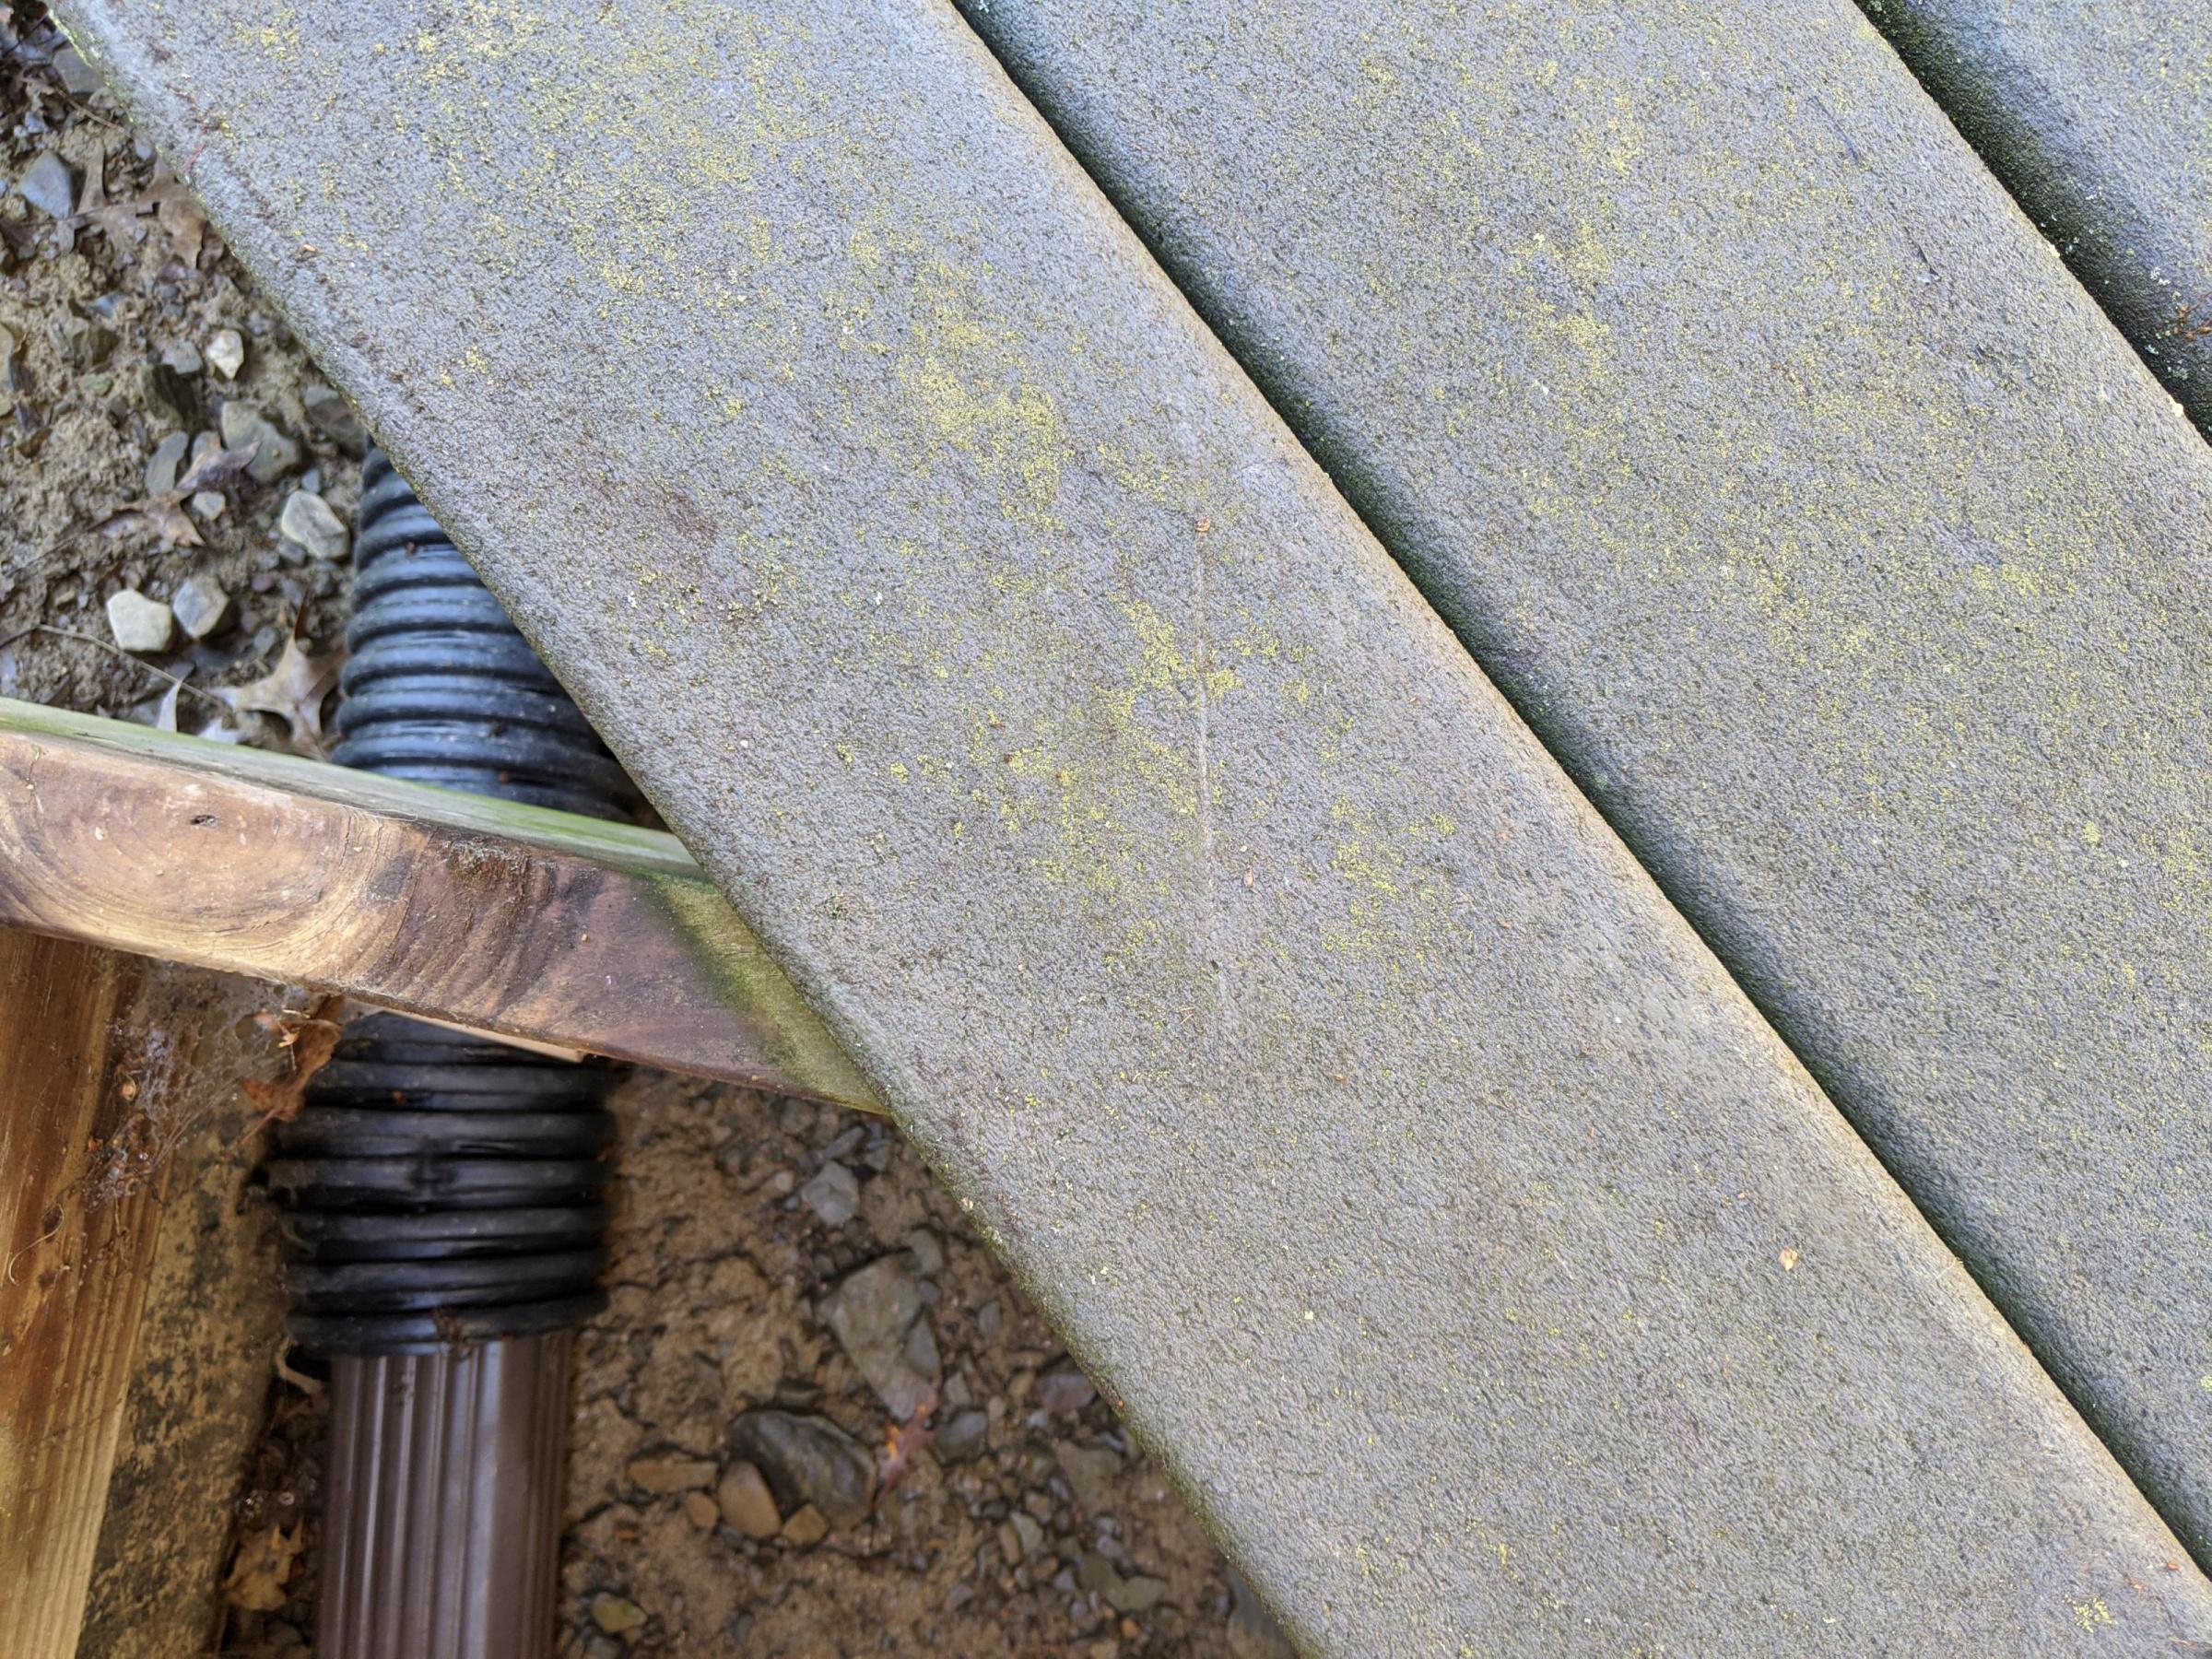 Front porch rebuild-img_20200702_101318_1593699302285.jpg